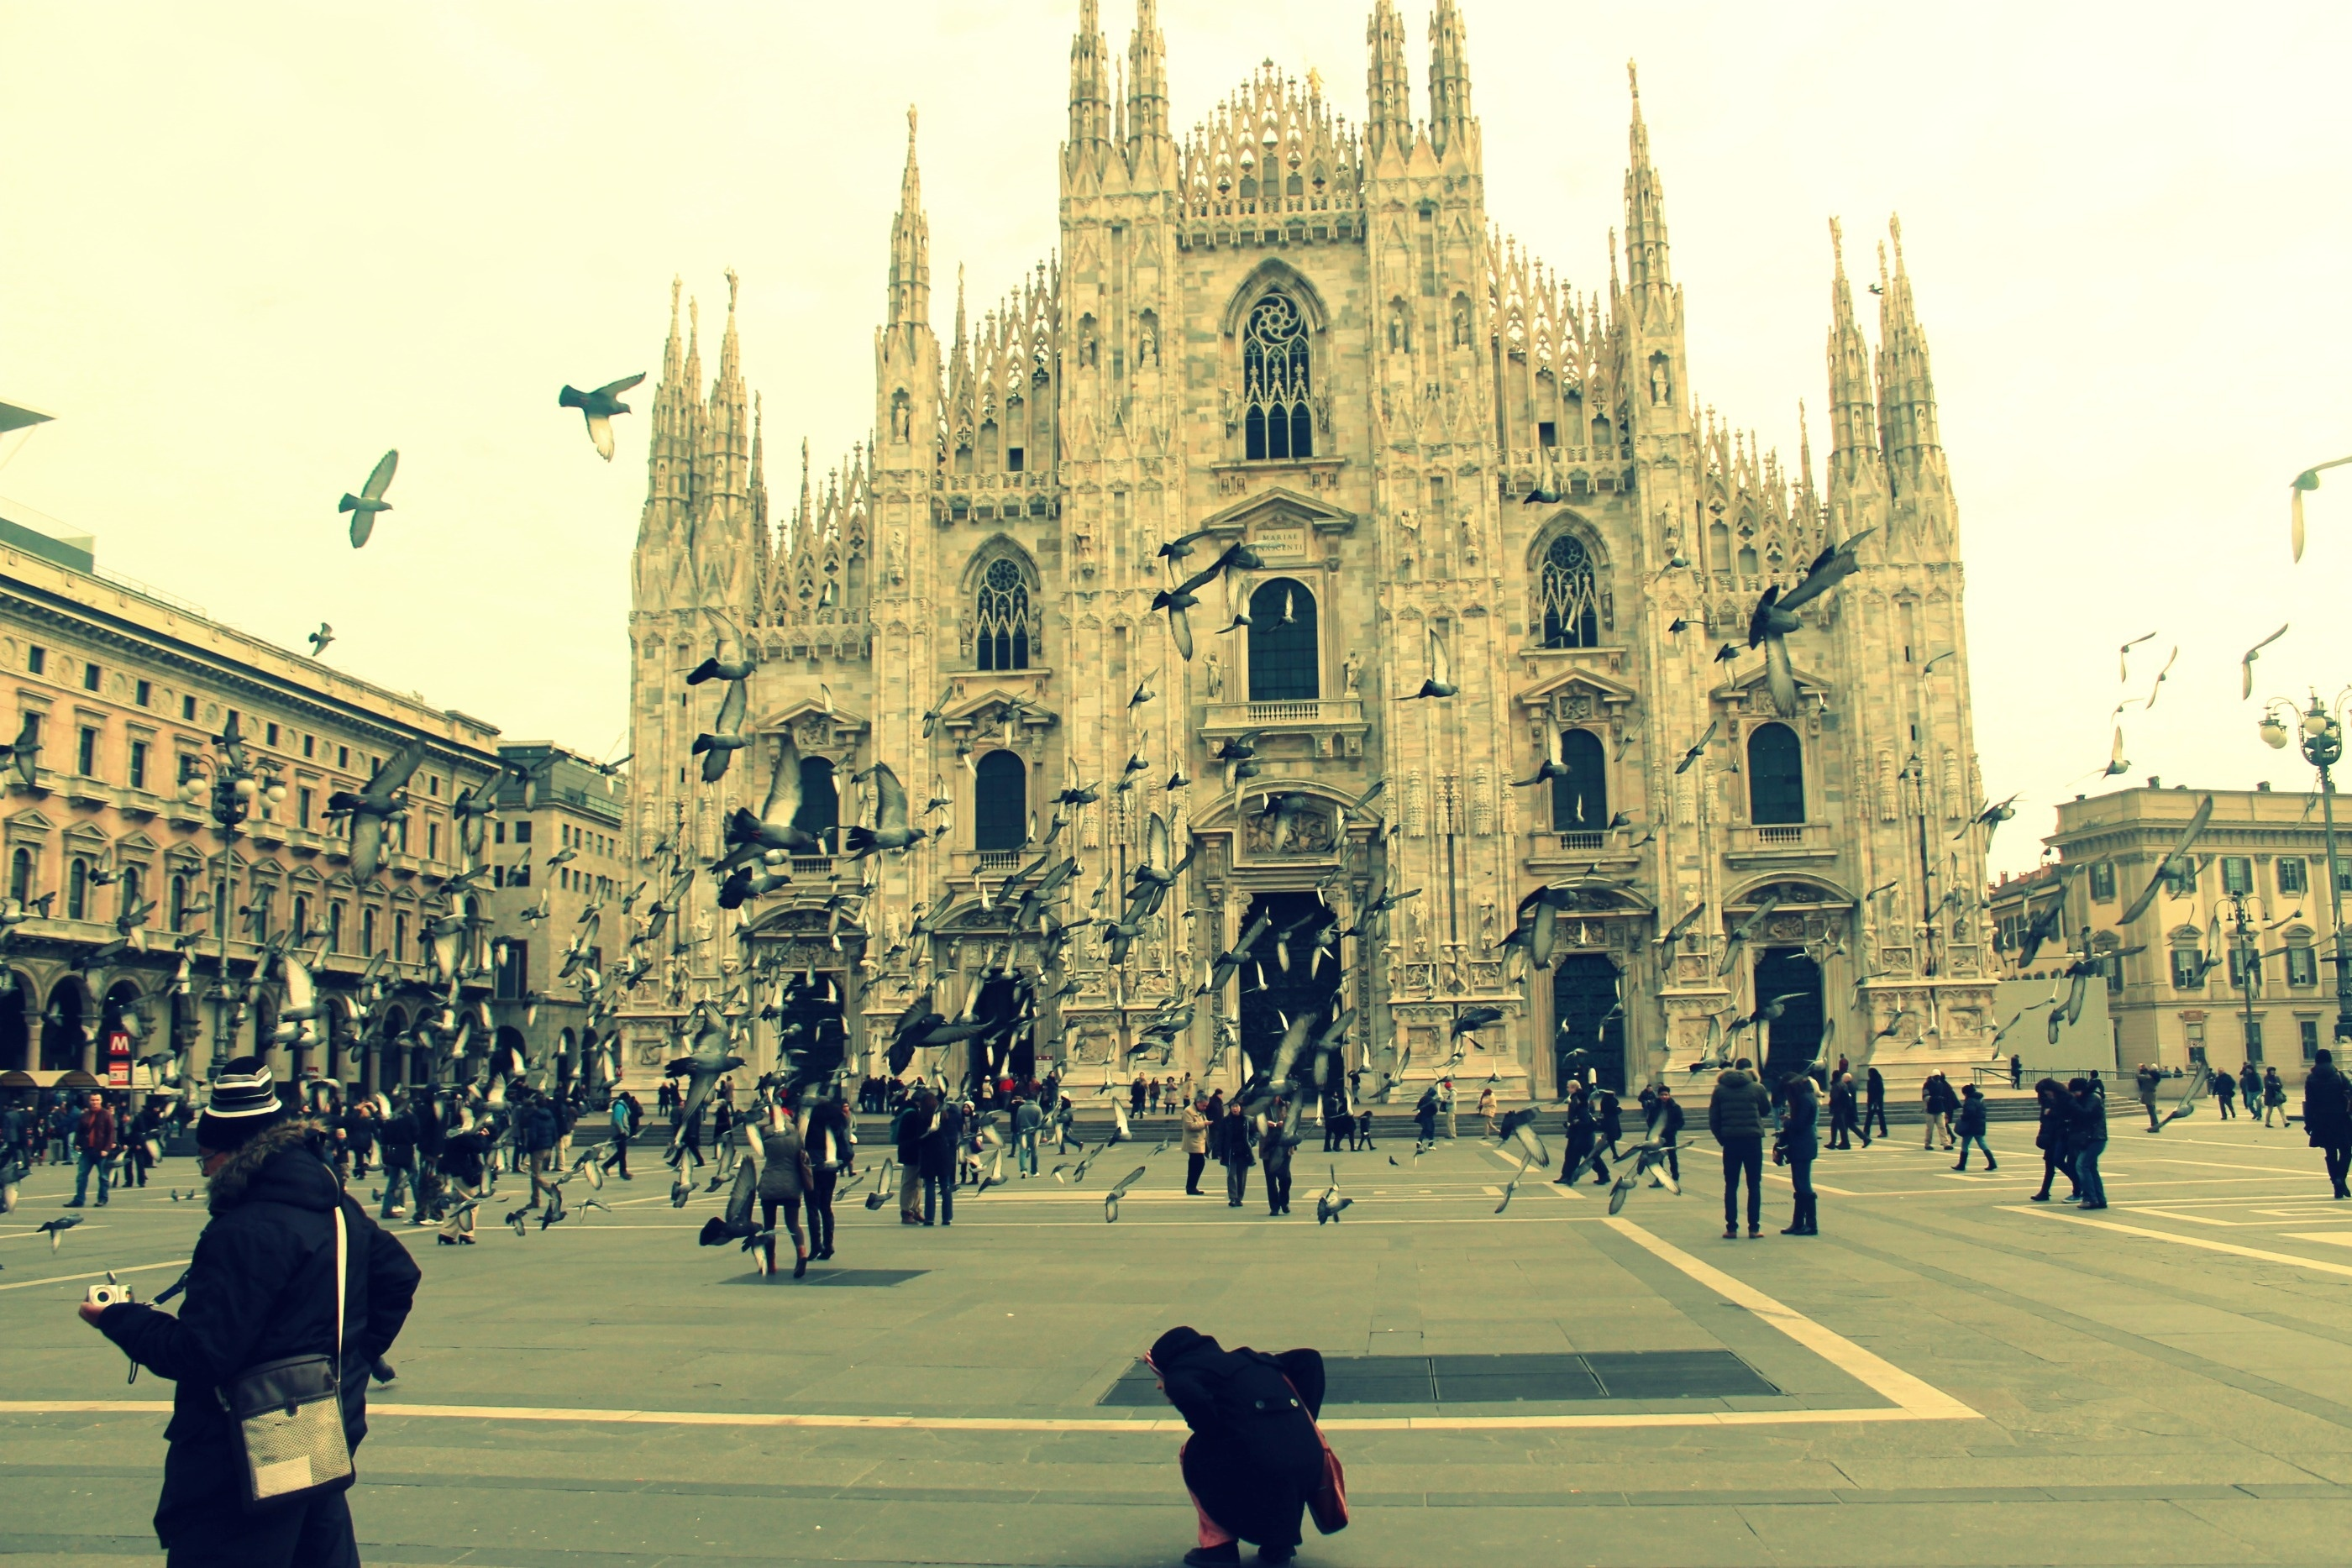 Милан картинки на рабочий стол, выздоравливай